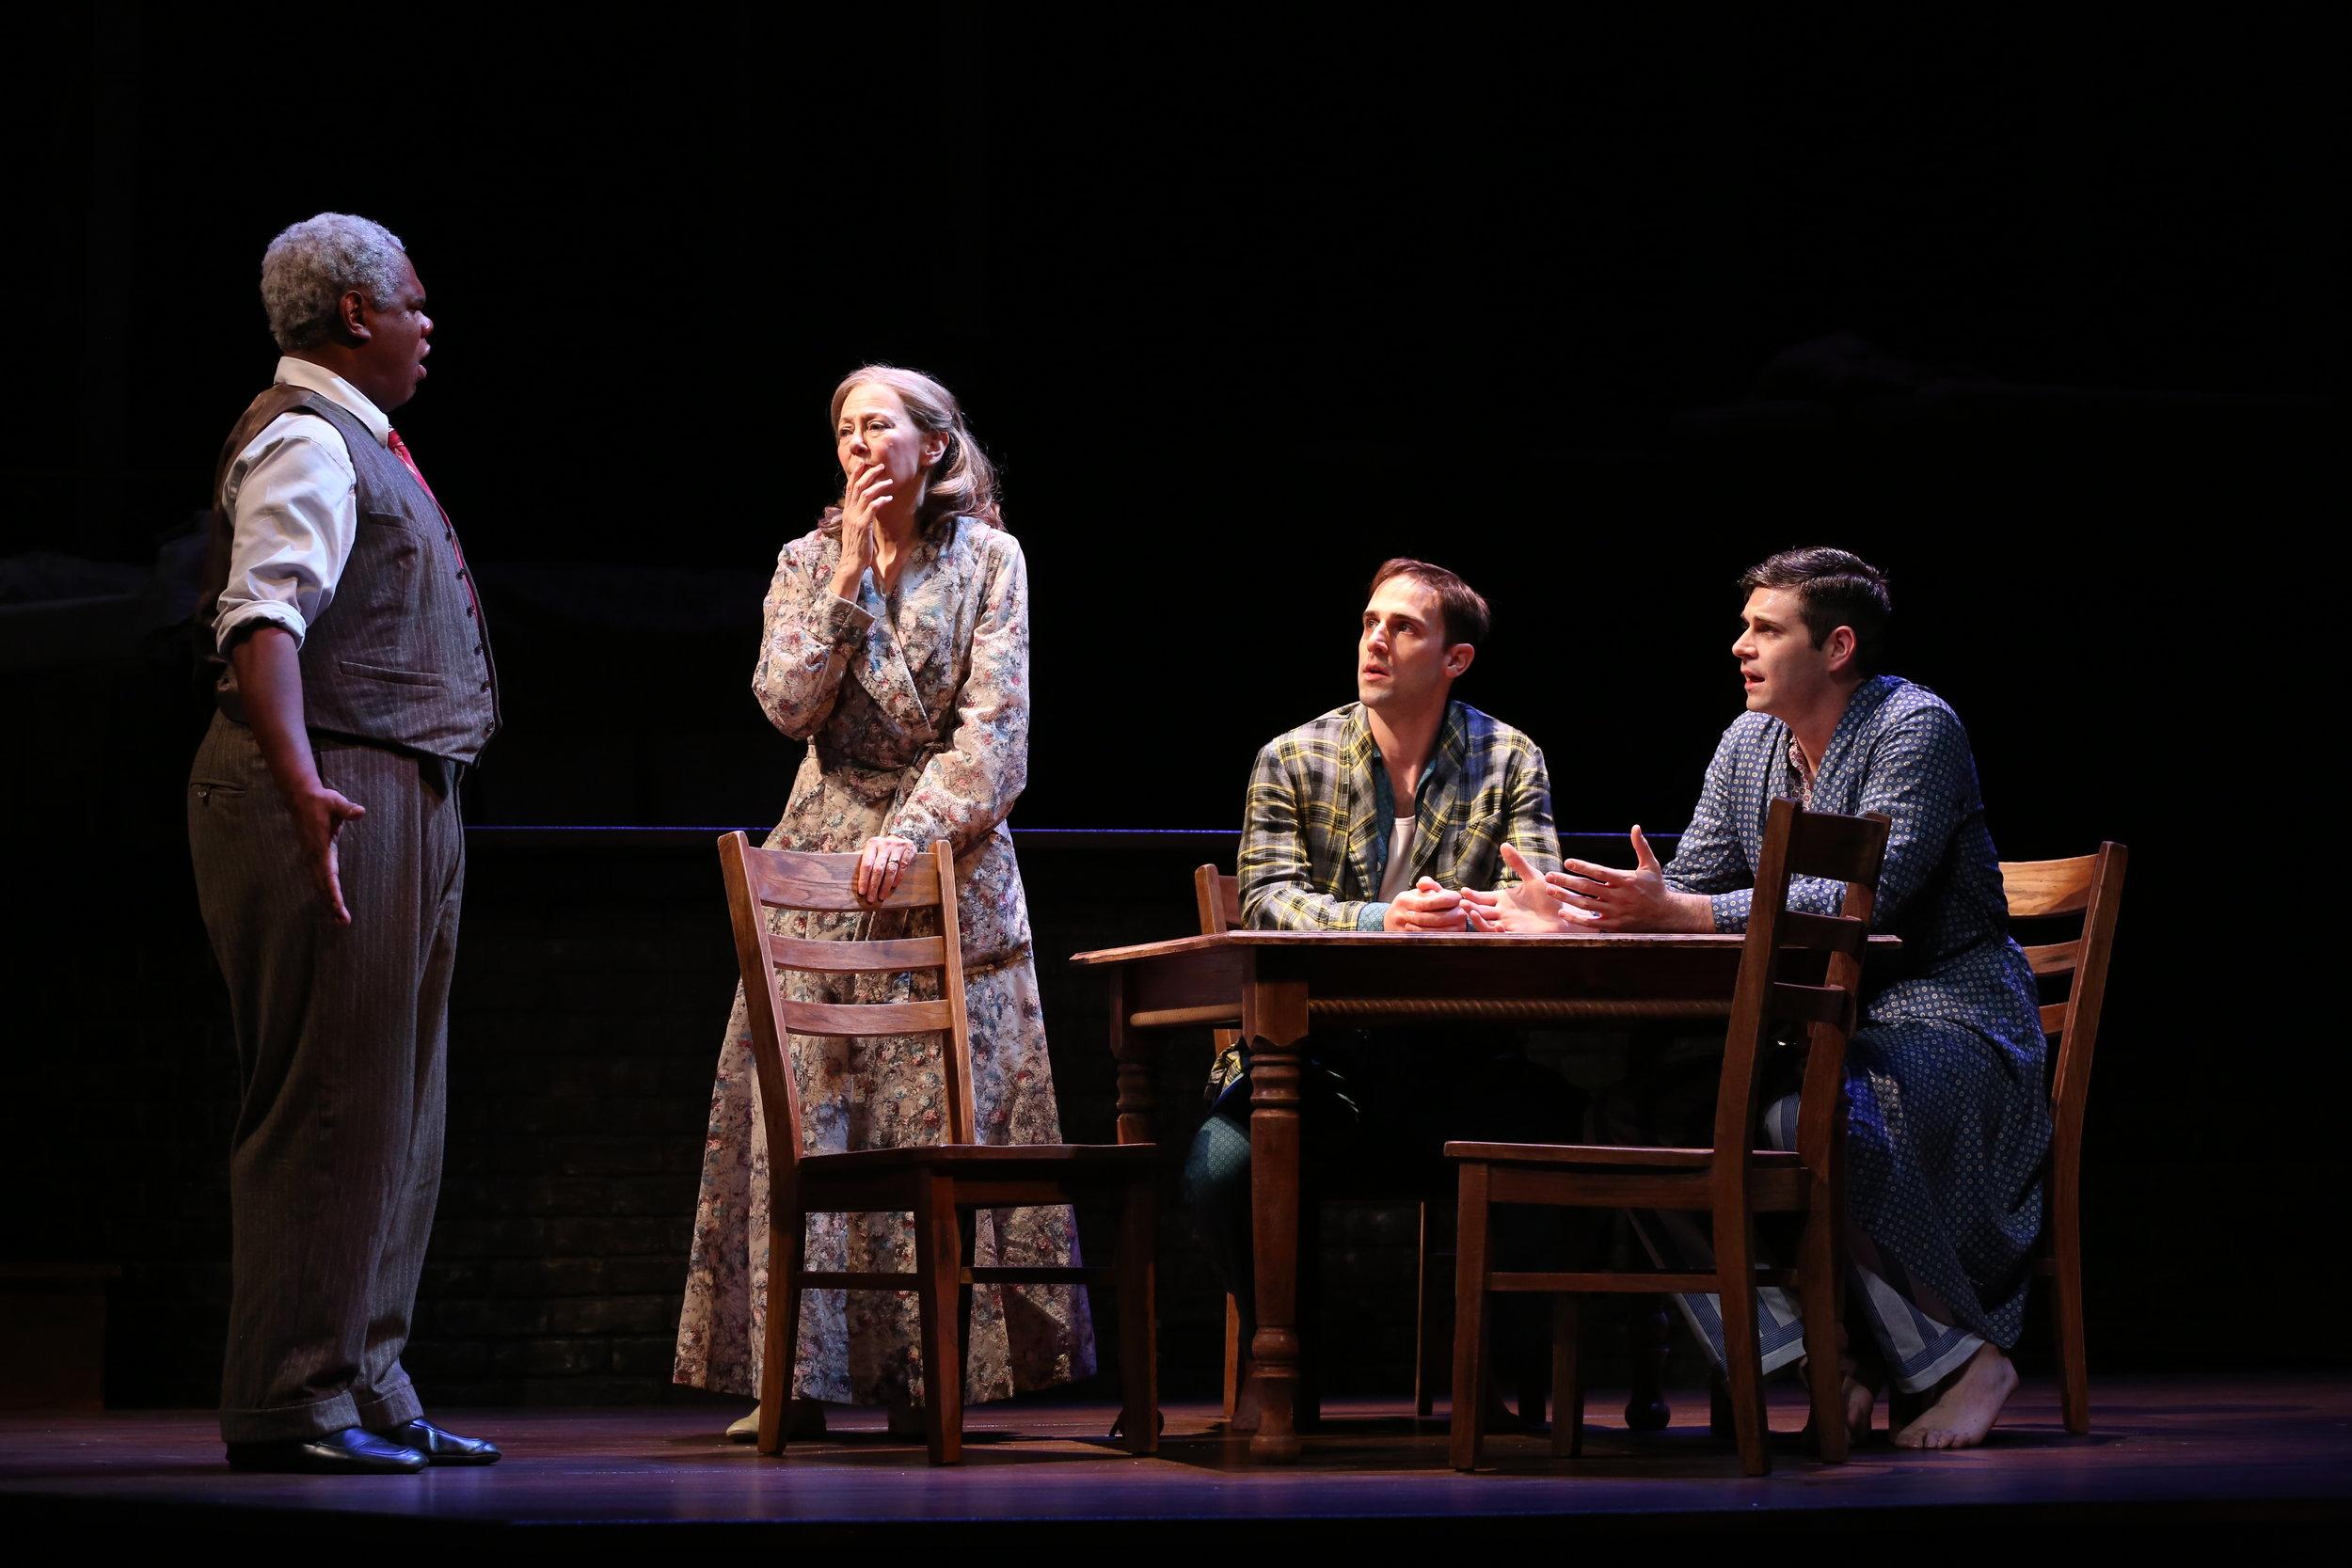 Craig Wallace, Kim Schraf, Danny Gavigan, and Thomas Keegan as the Lomans. (Carol Rosegg)